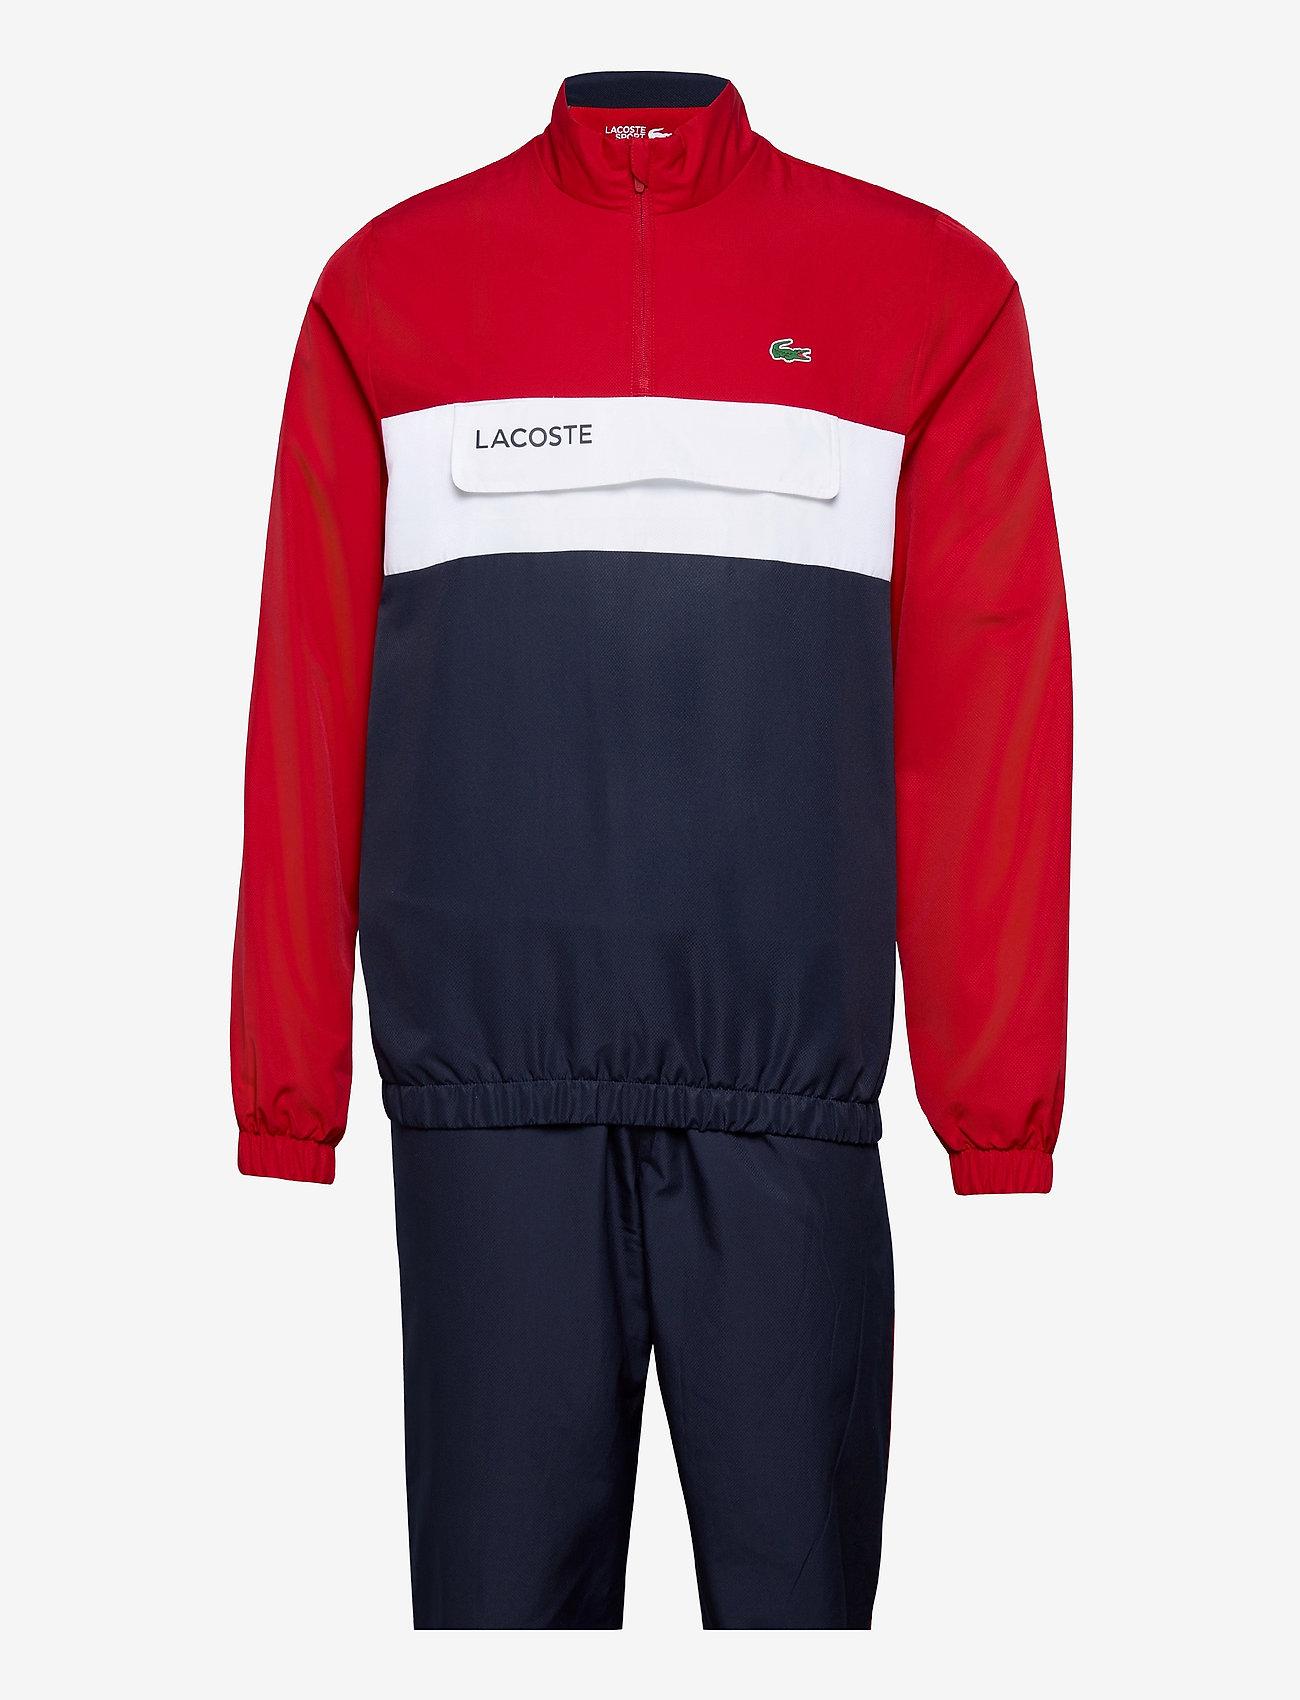 Lacoste - Men s tracksuit - dresy - ruby/navy blue-white - 0